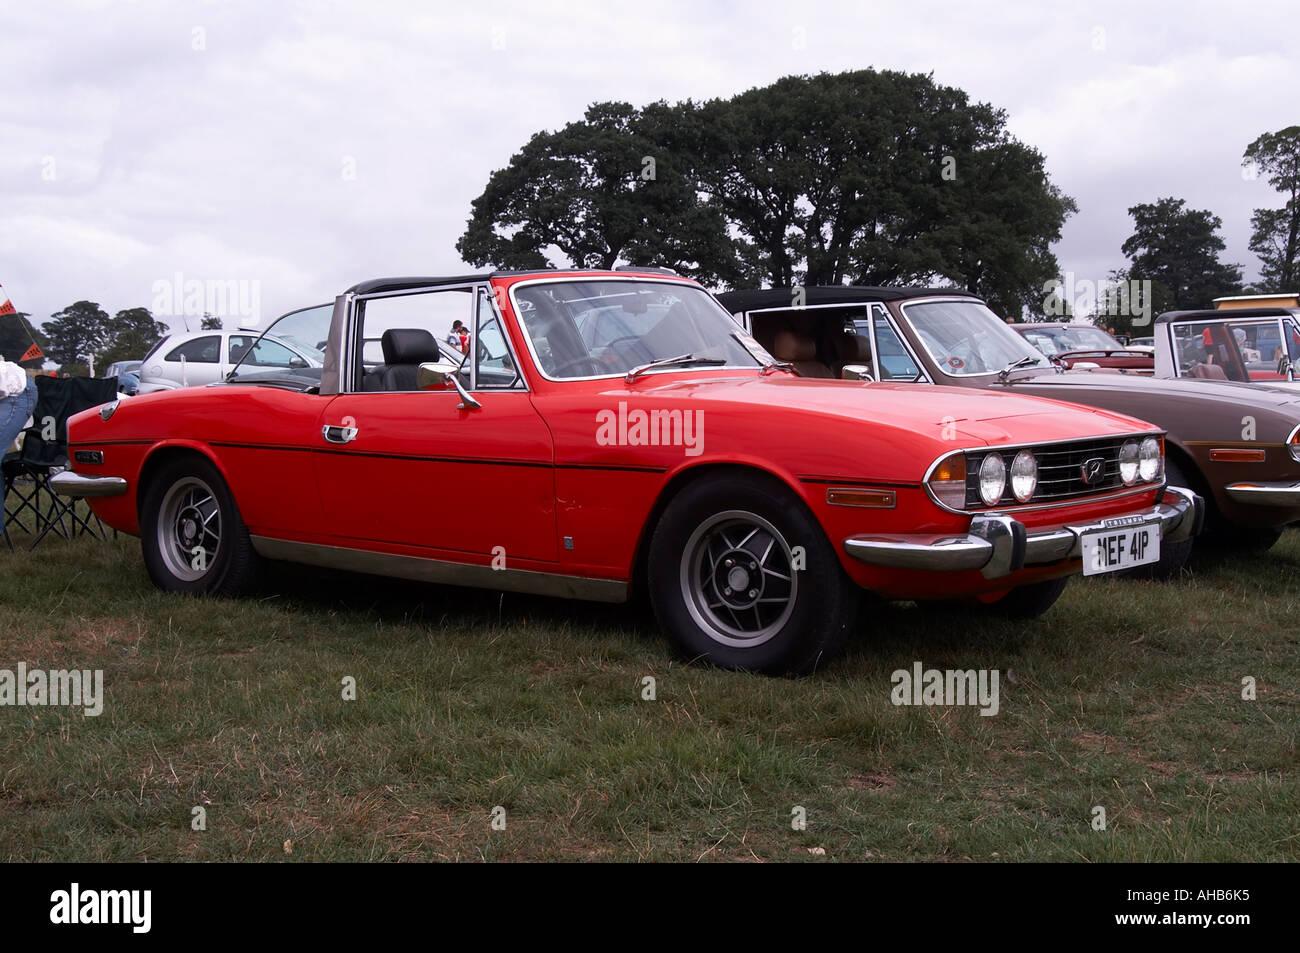 Triumph Stag Car British Sports Car Luxury Stock Photo Royalty - British sports cars 70s